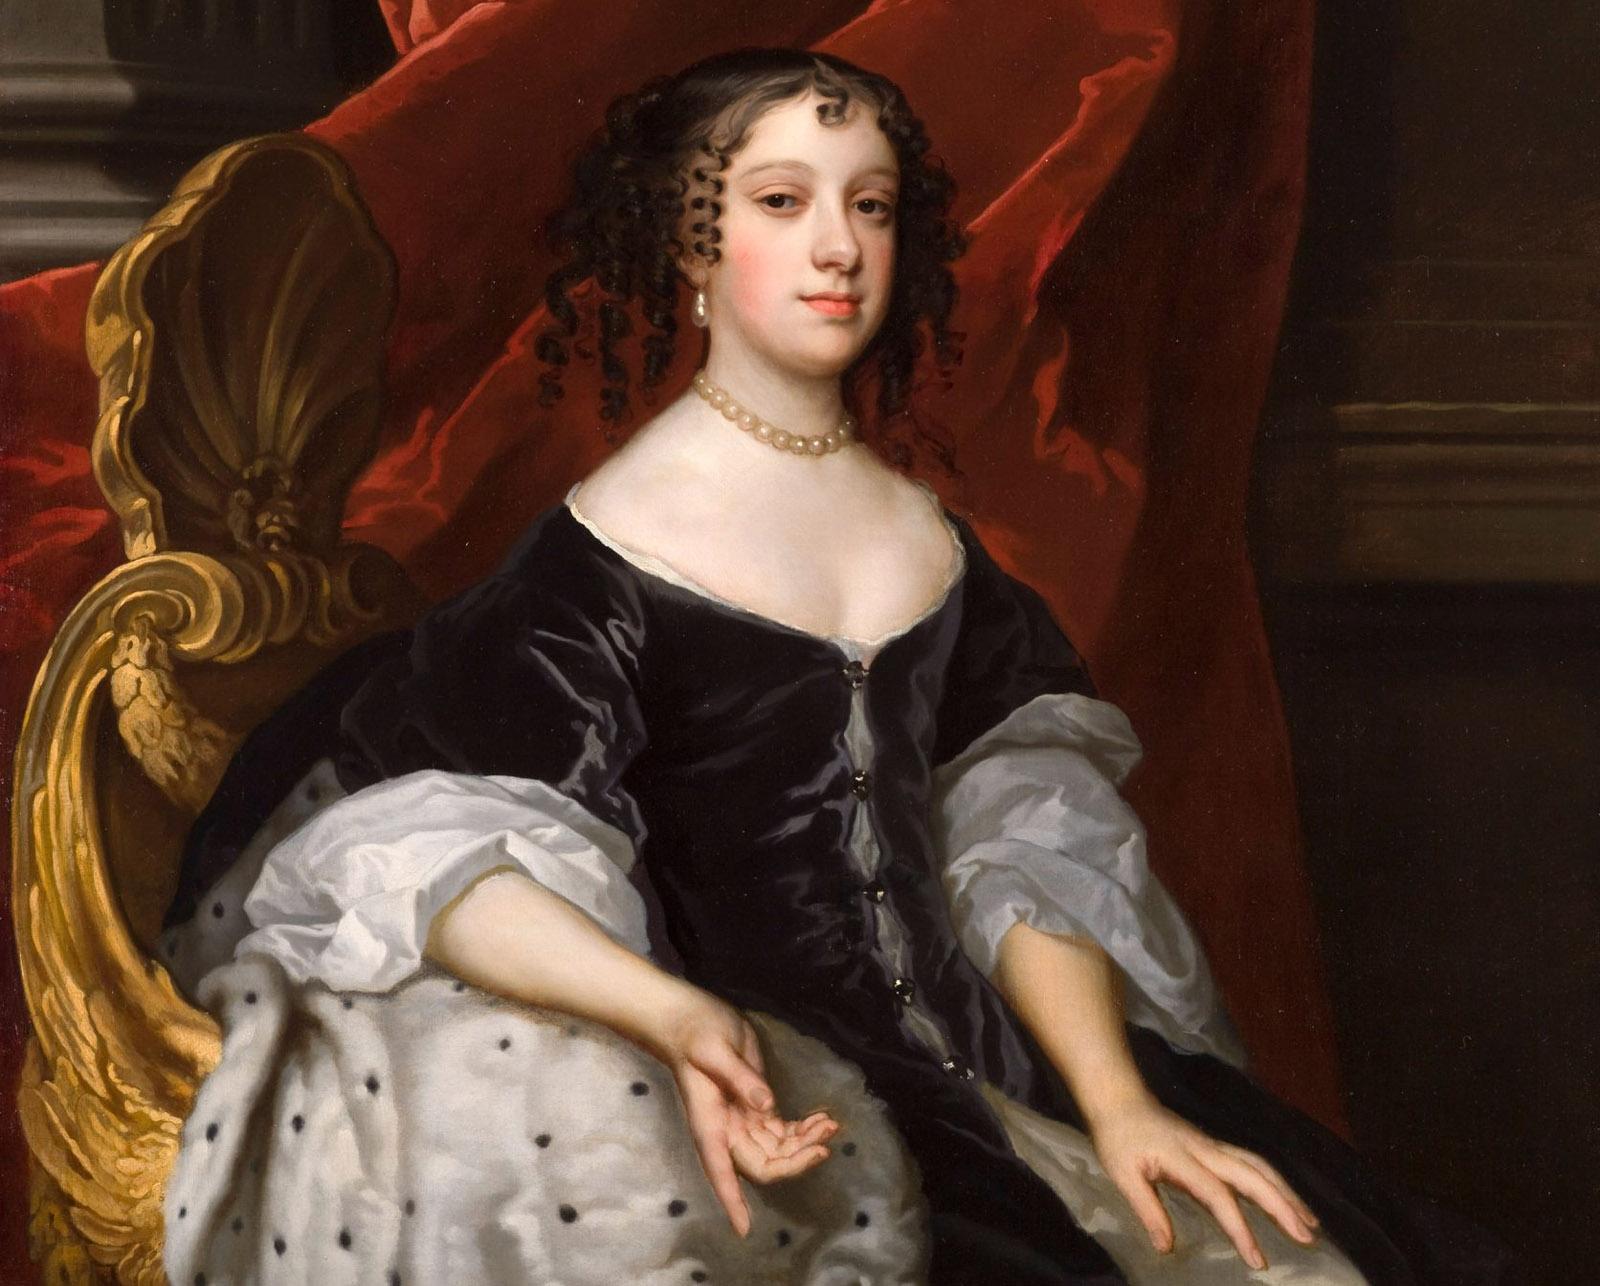 La première grande dame du thé en Europe